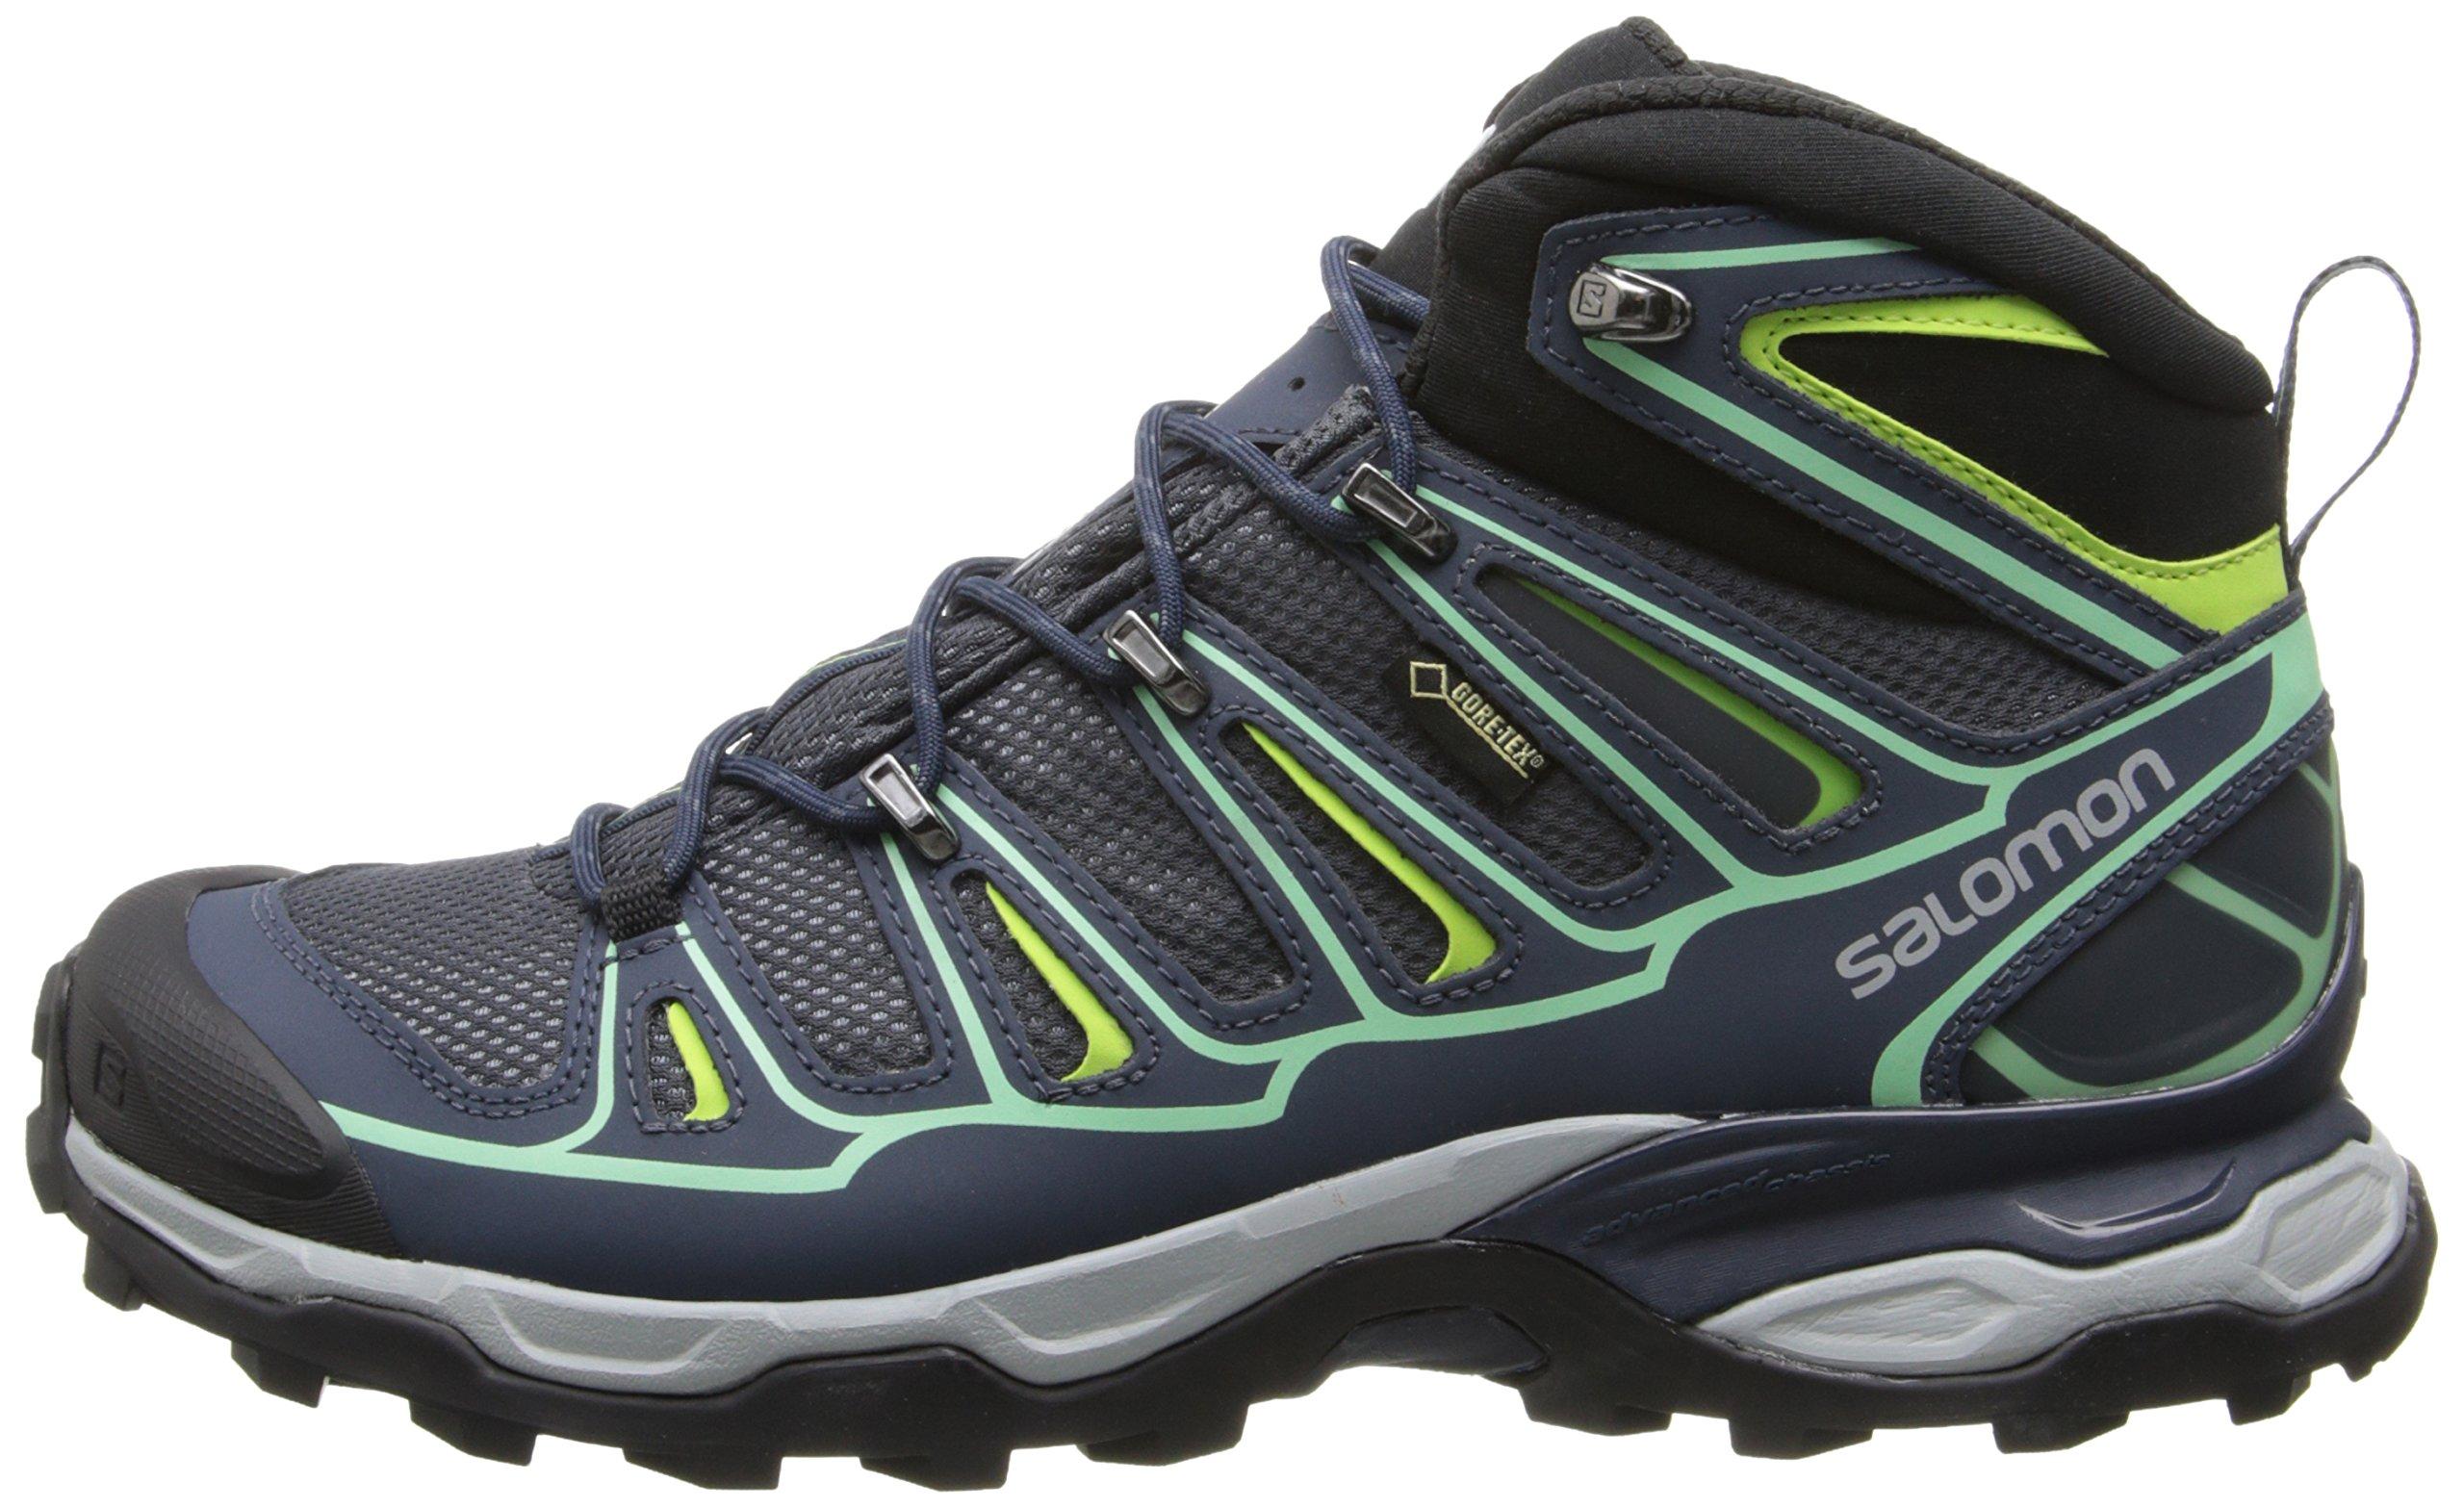 Salomon Women's X Ultra Mid 2 GTX Hiking Shoe, Grey Denim/Deep Blue/Lucite Green, 9 M US by Salomon (Image #5)